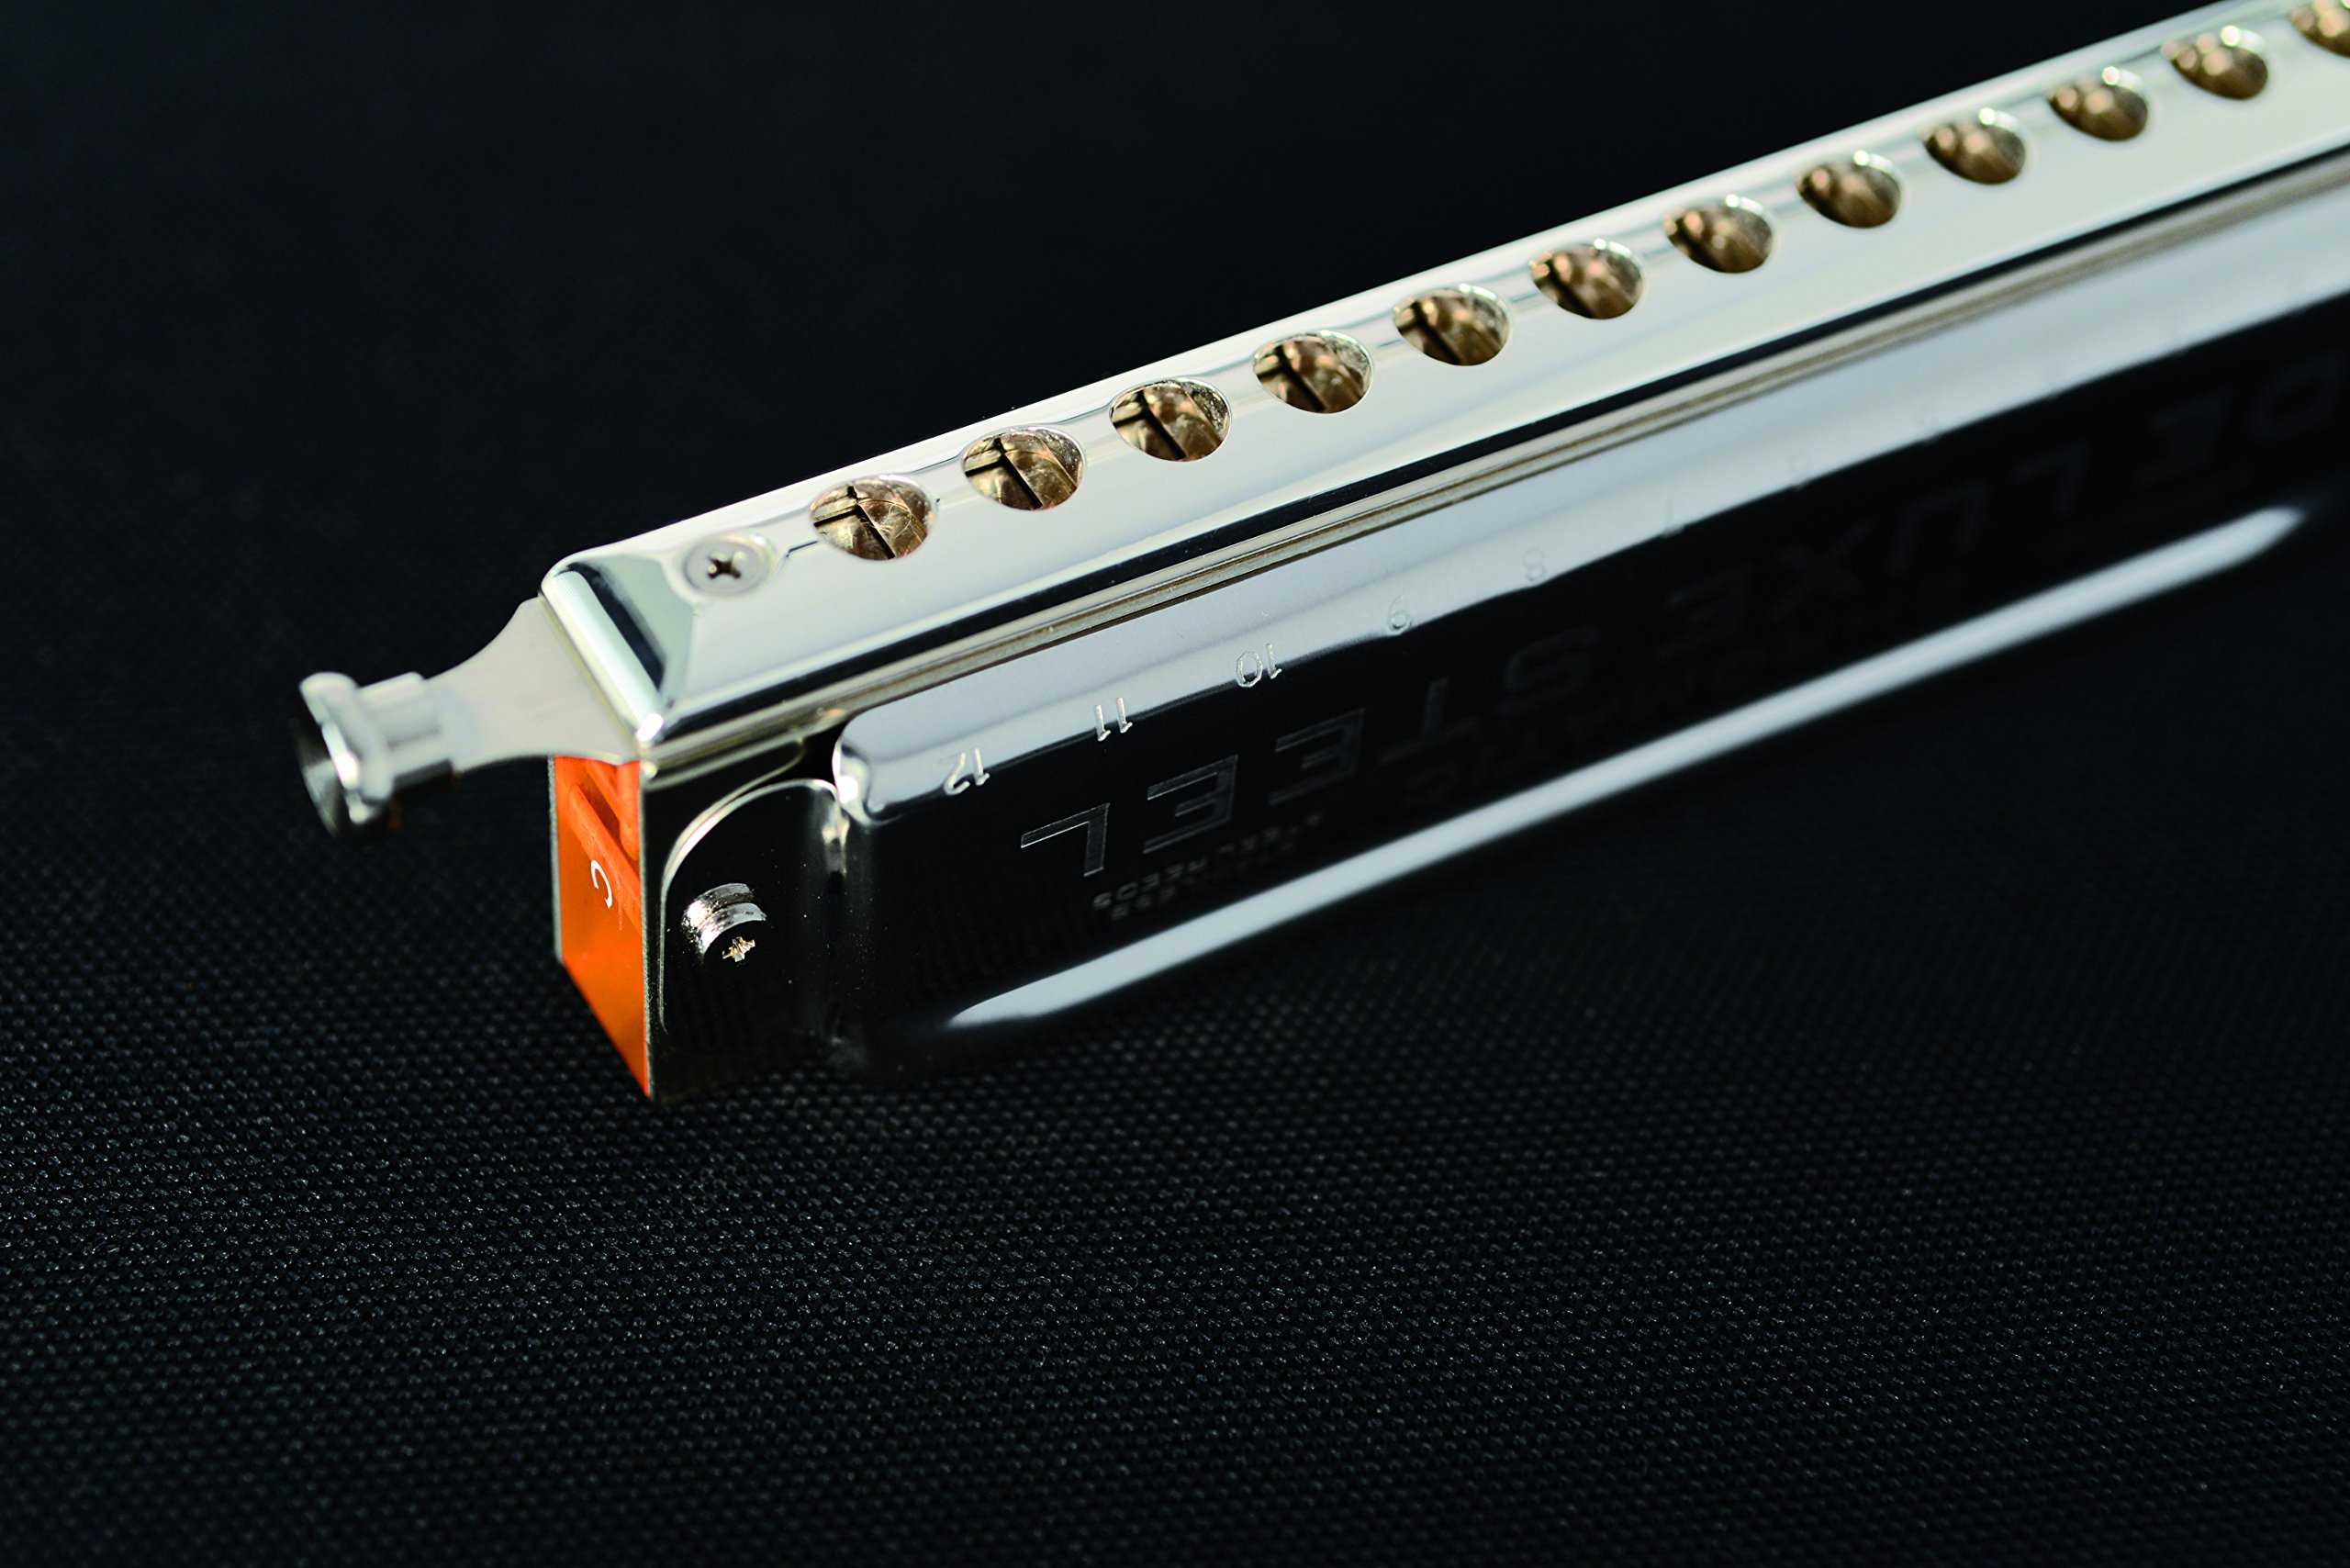 SEYDEL Chromatic DeLuxe Steel Solo Harmonica C by Seydel (Image #3)